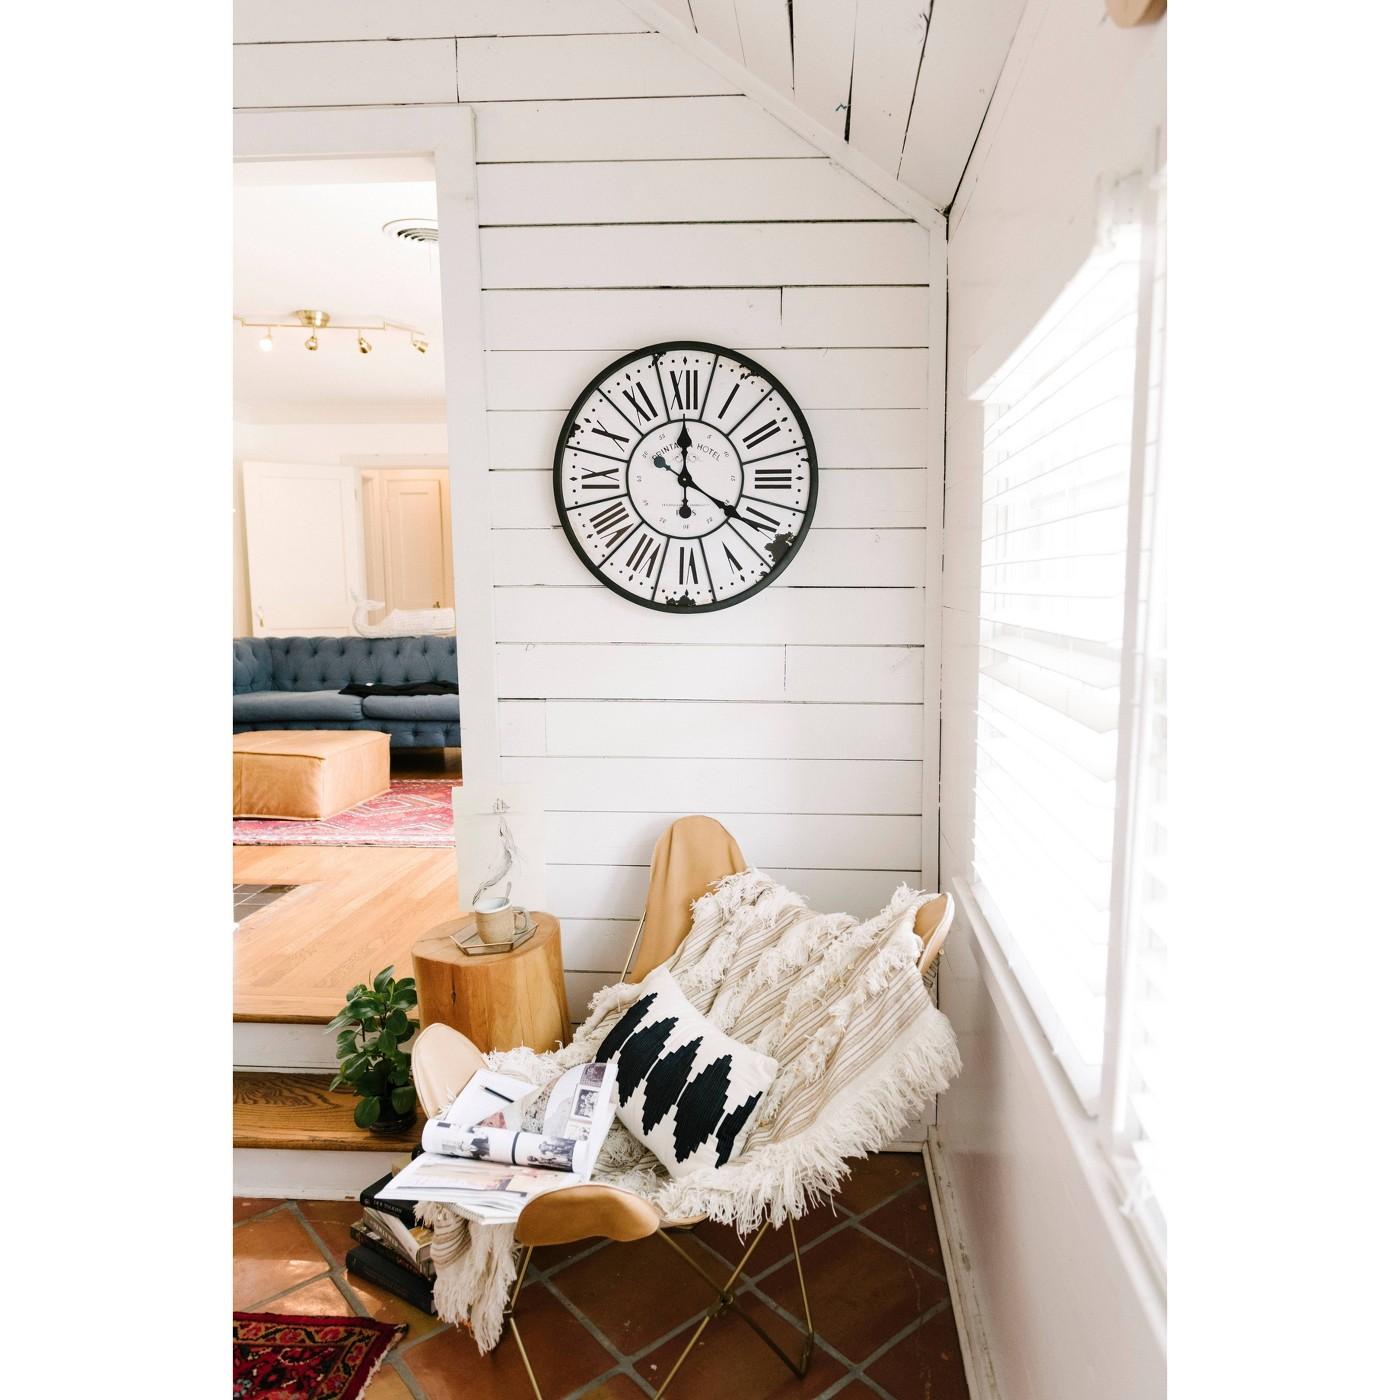 "24"" Round Metal & Wood Clock Black/White - 3R Studios - image 6 of 9"